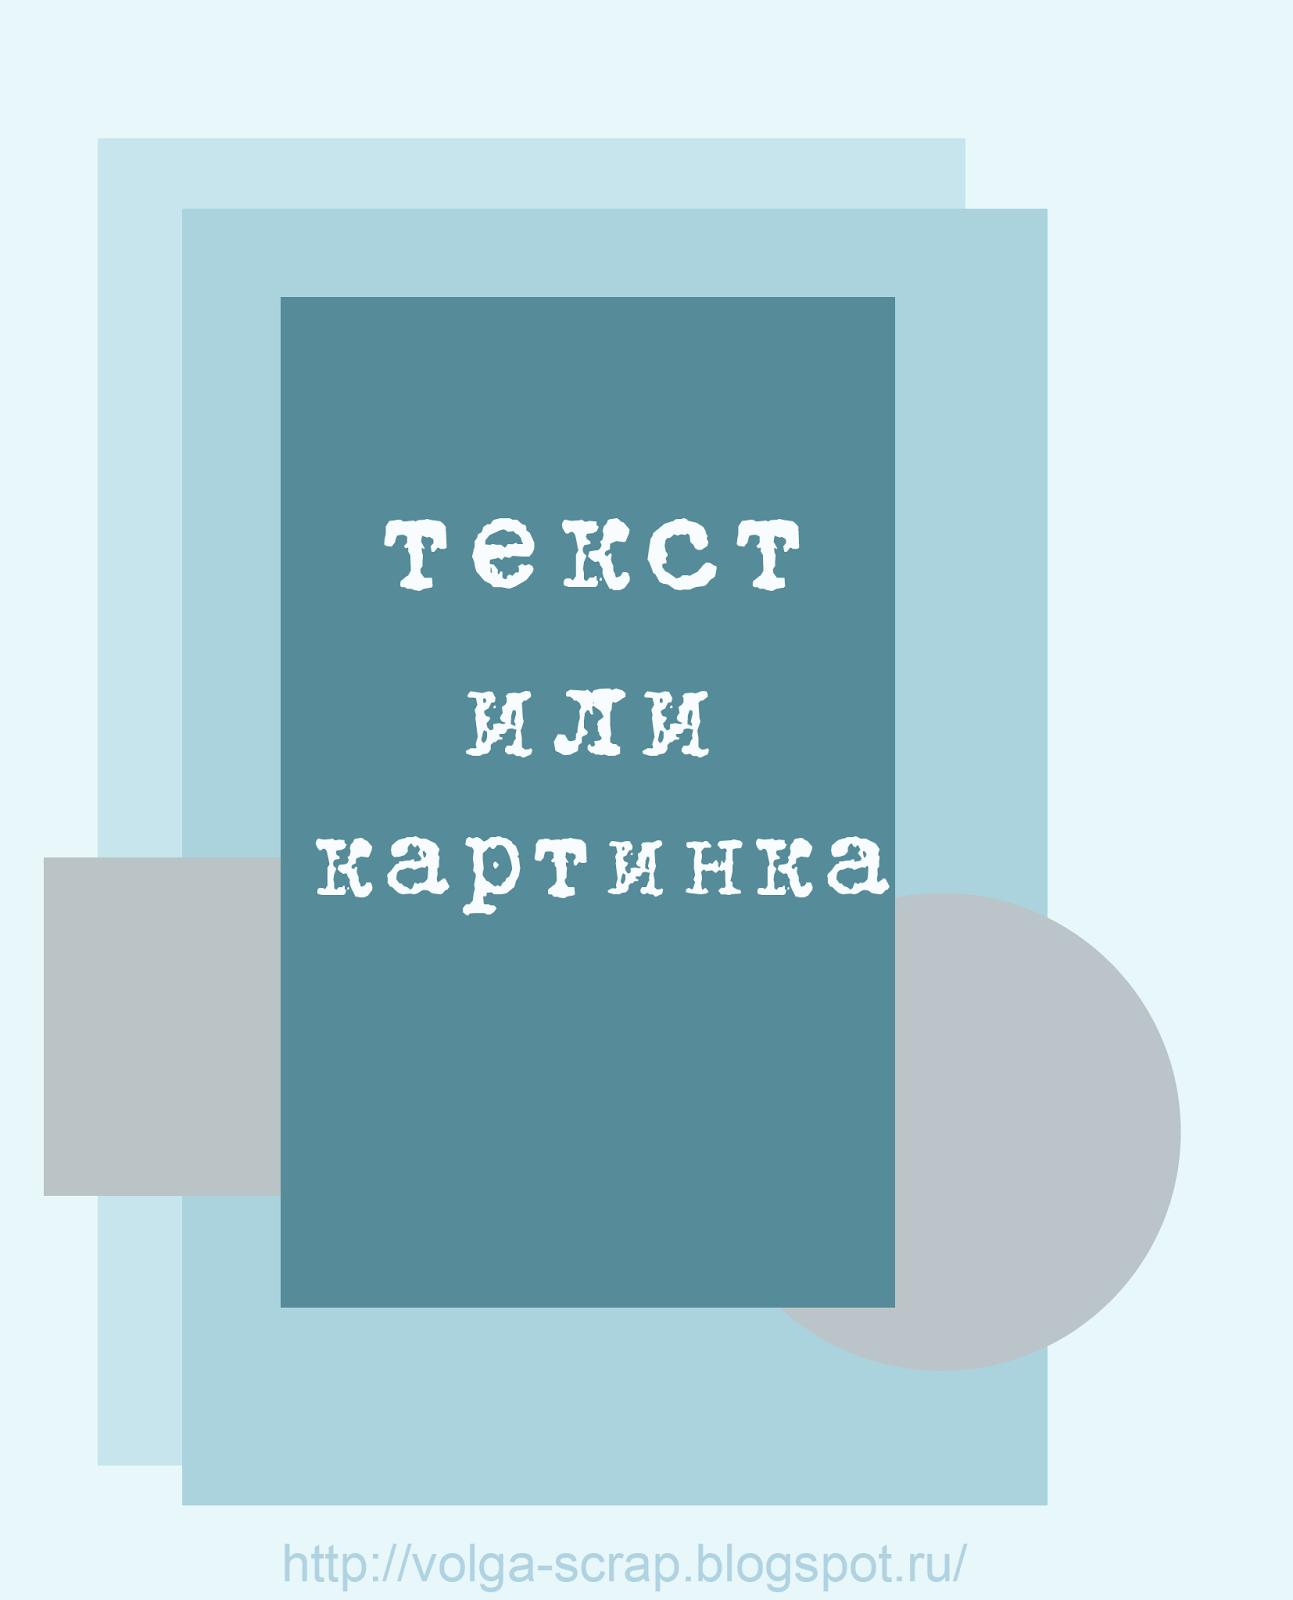 http://volga-scrap.blogspot.ru/2015/12/1412-1001.html